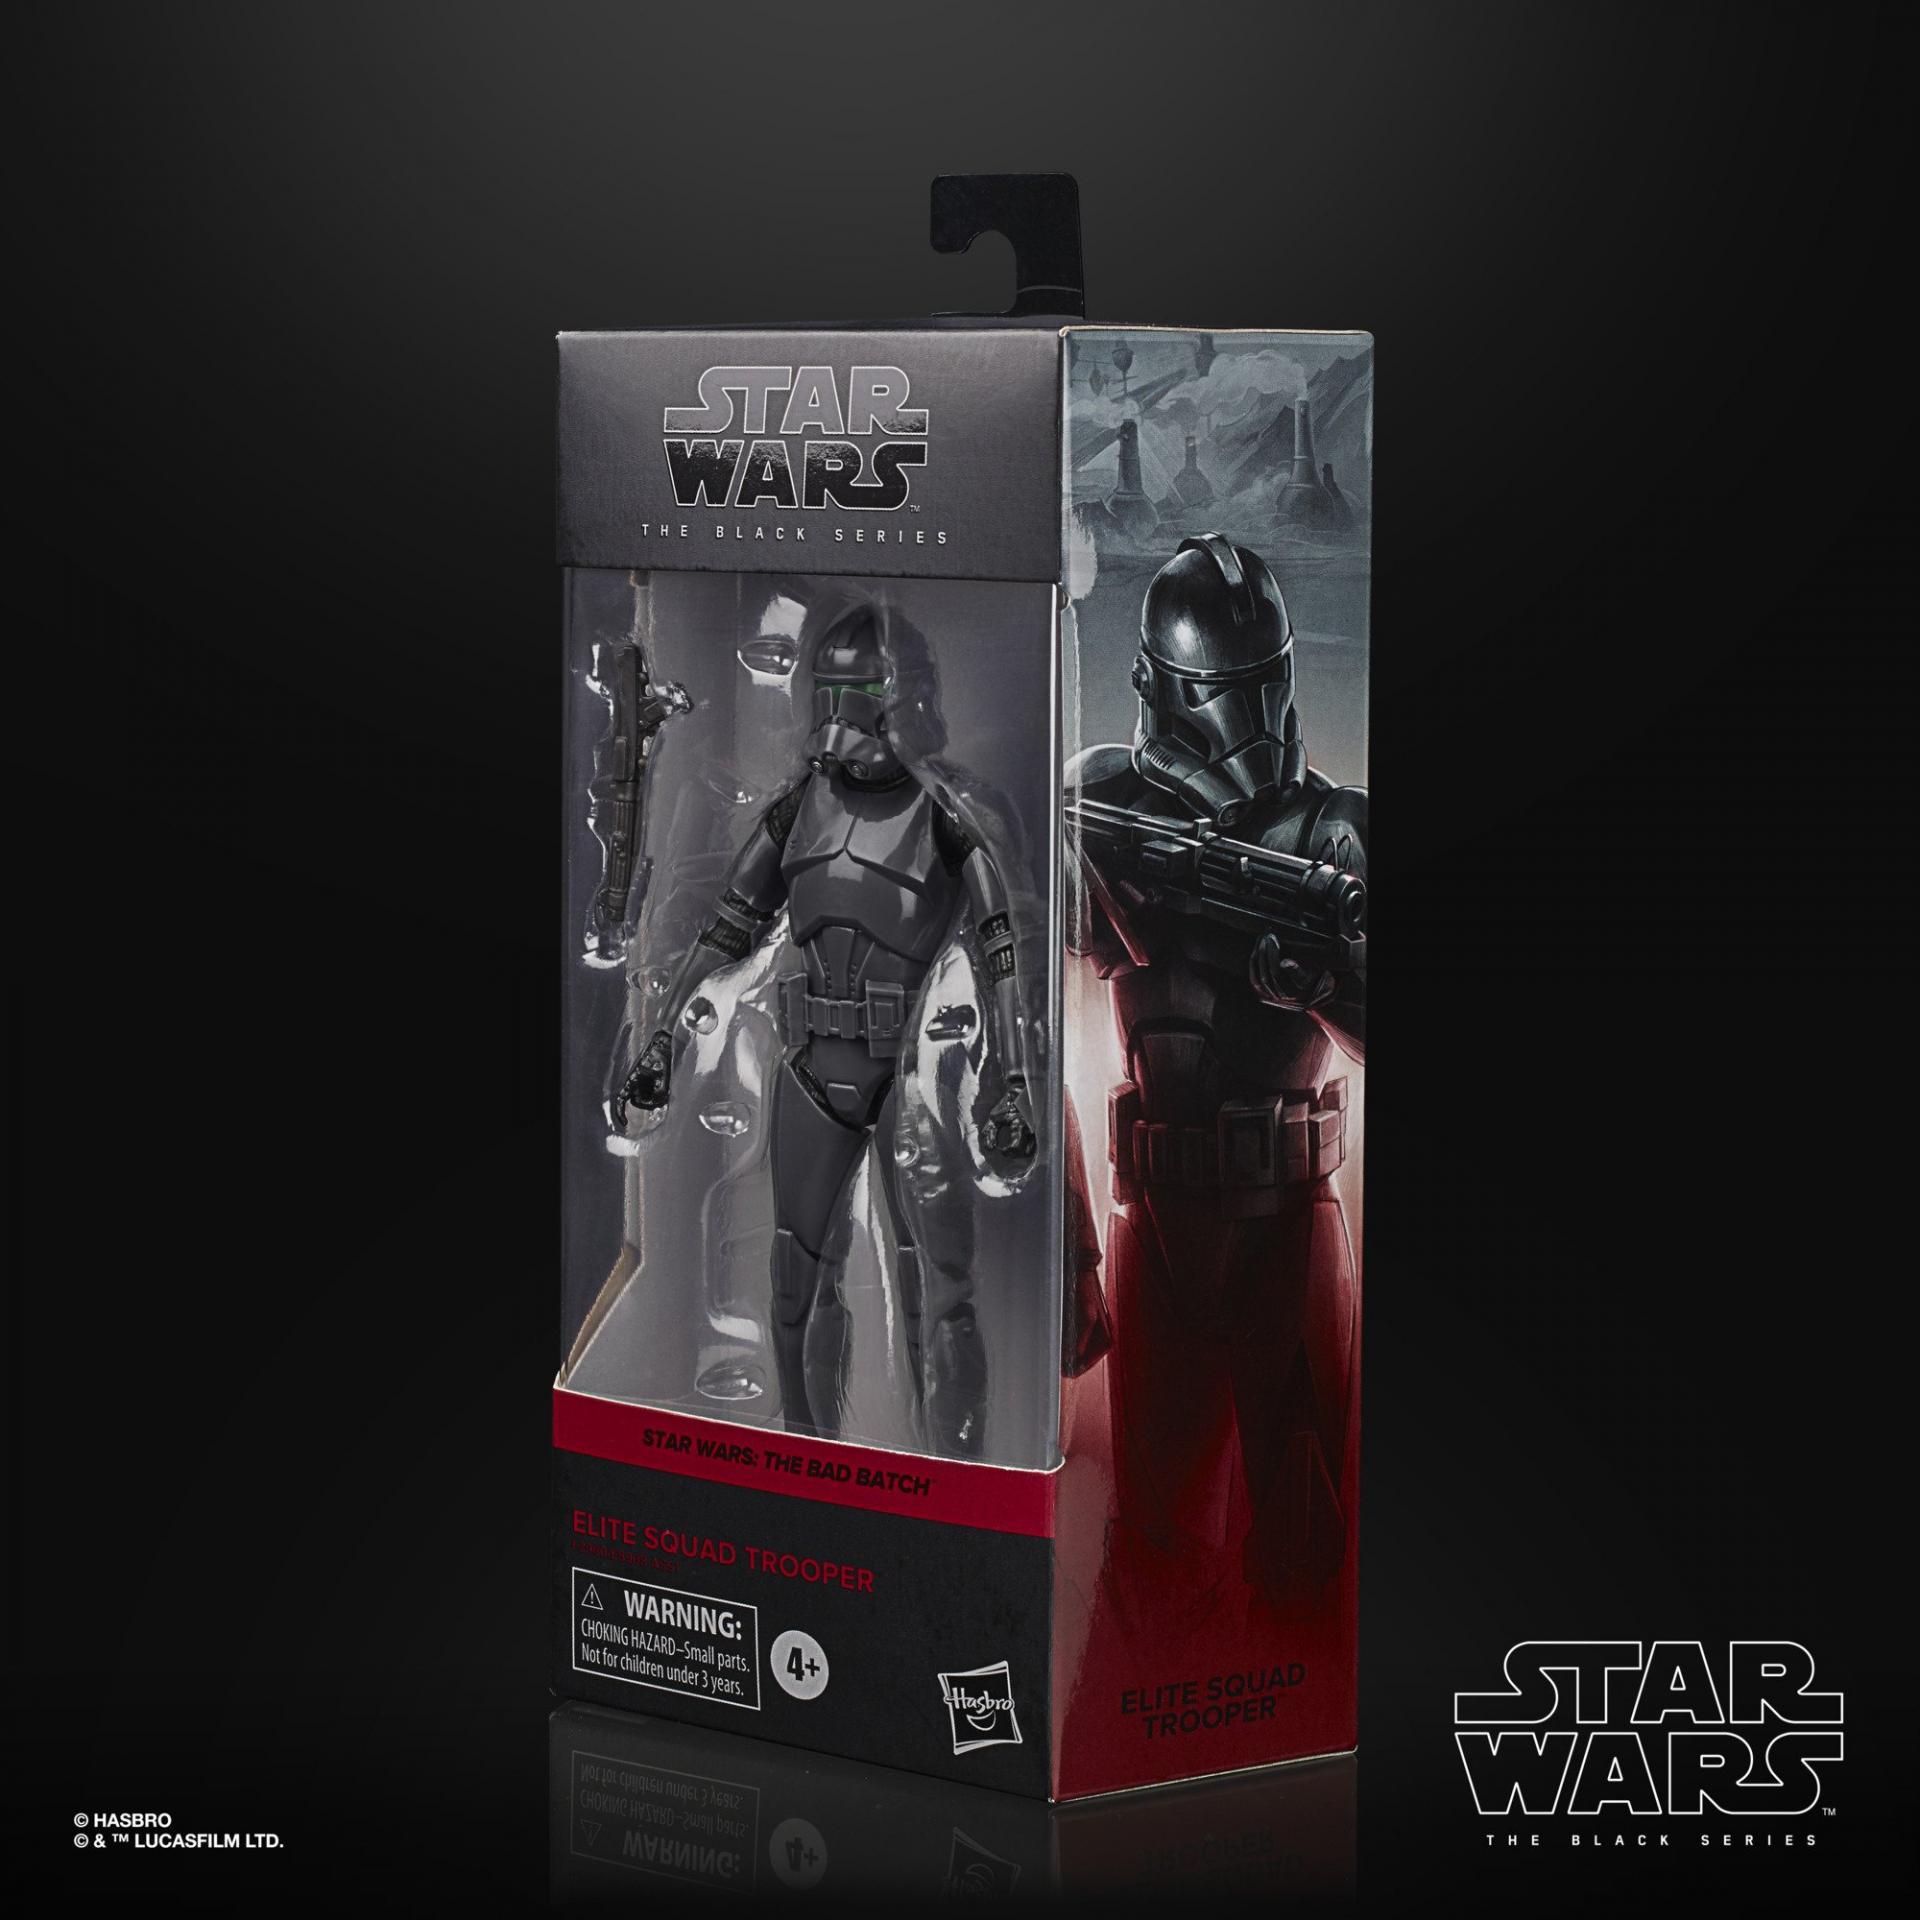 Star wars the black series elite squad trooper 15cm4